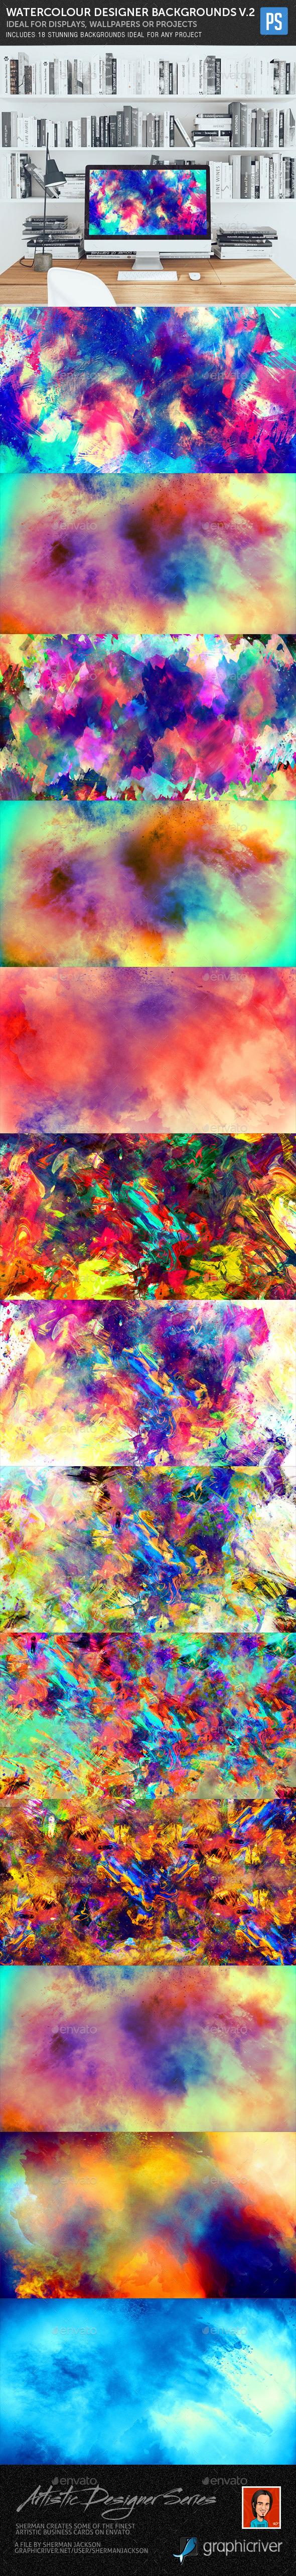 Watercolour Designer Backgrounds V.2 - Backgrounds Graphics